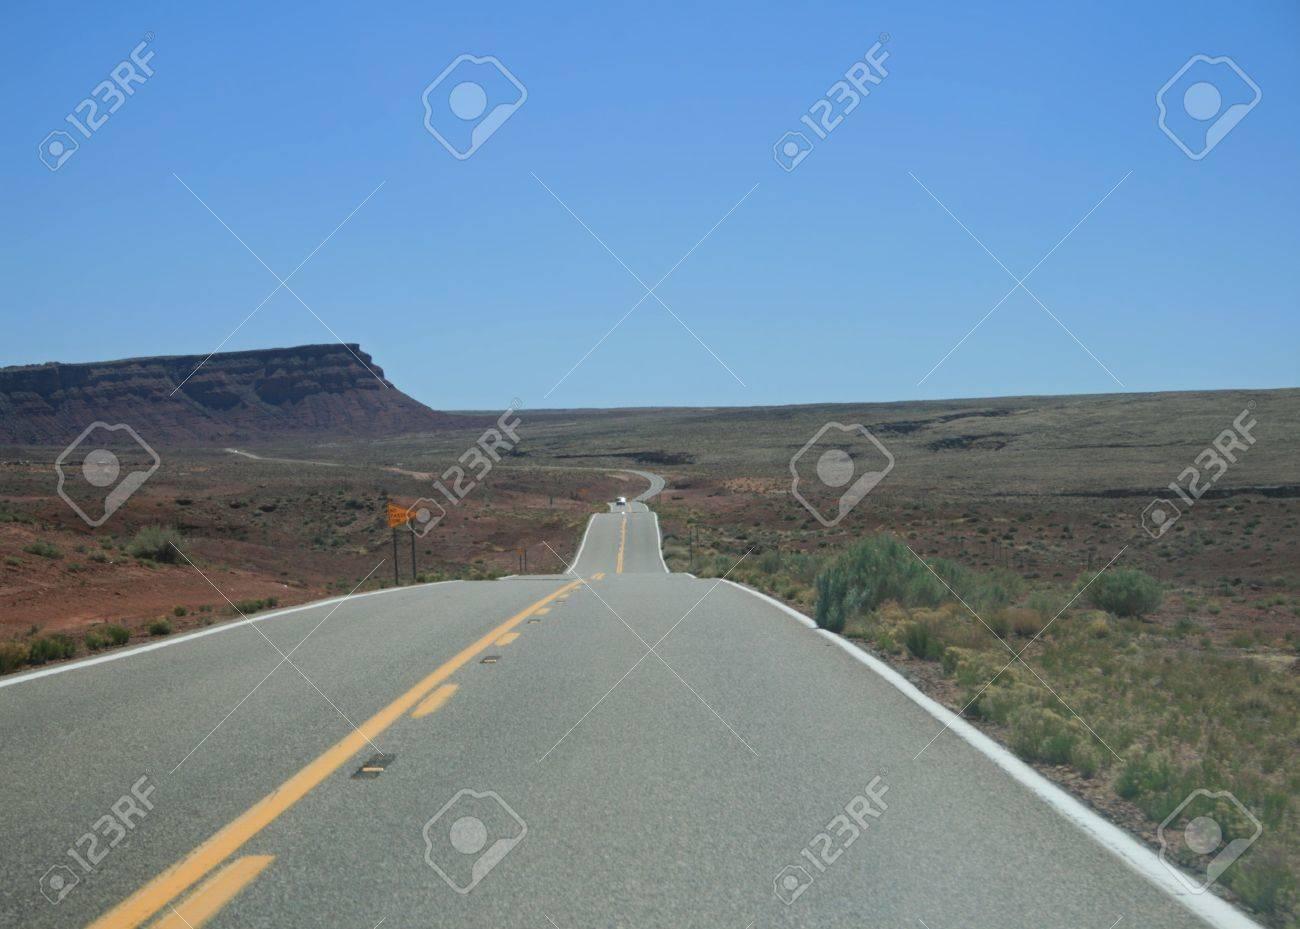 highway 89A in Northern Arizona cuts across the desert into heat haze Stock Photo - 3861265